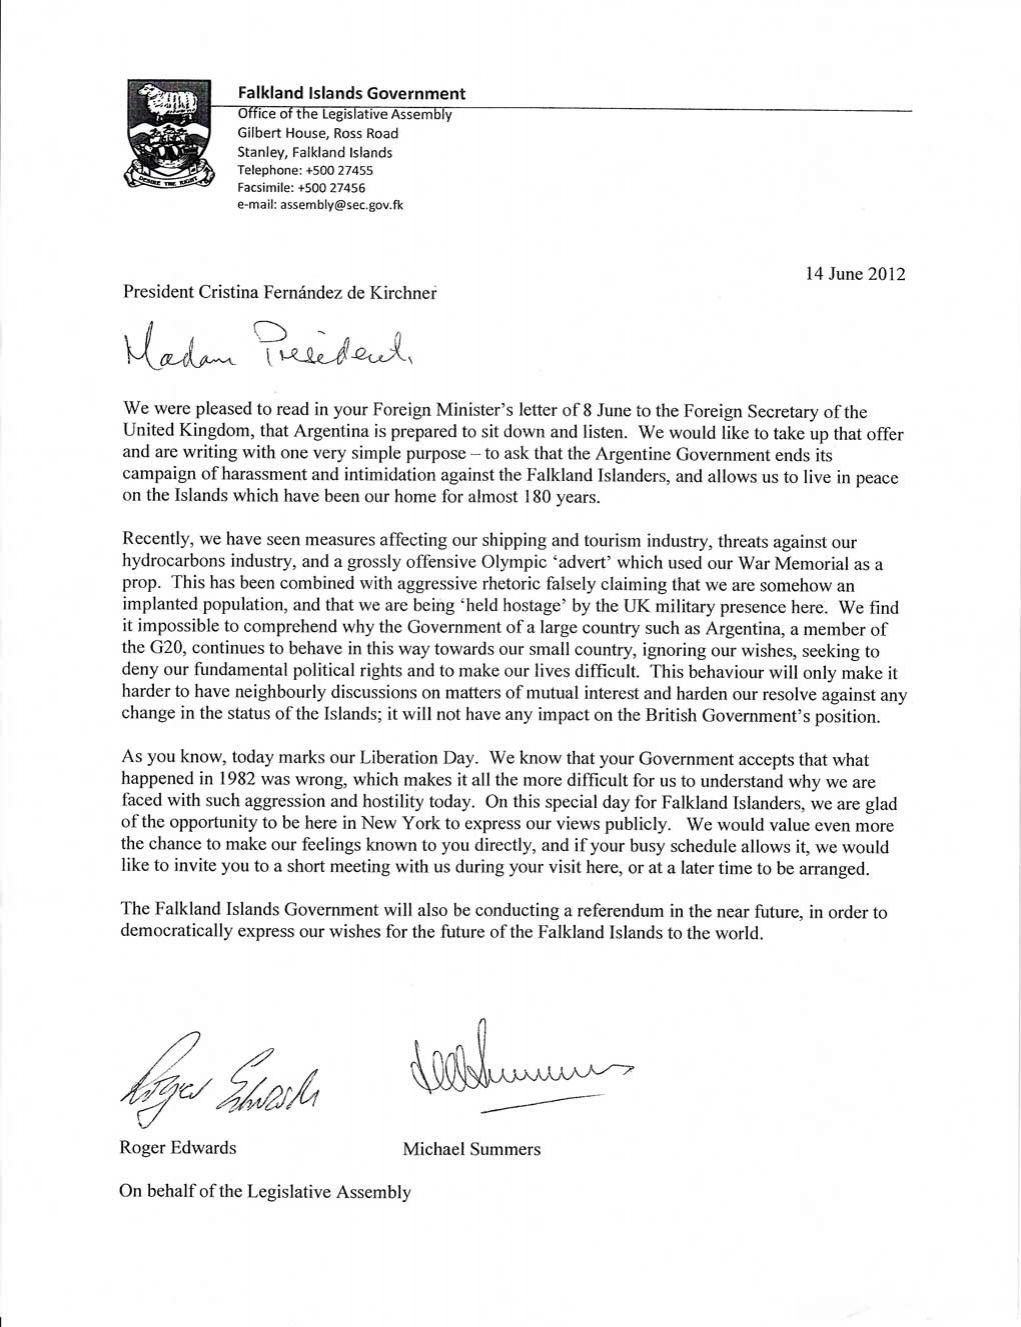 Sample Wedding Invitation Letter For Canadian Visa